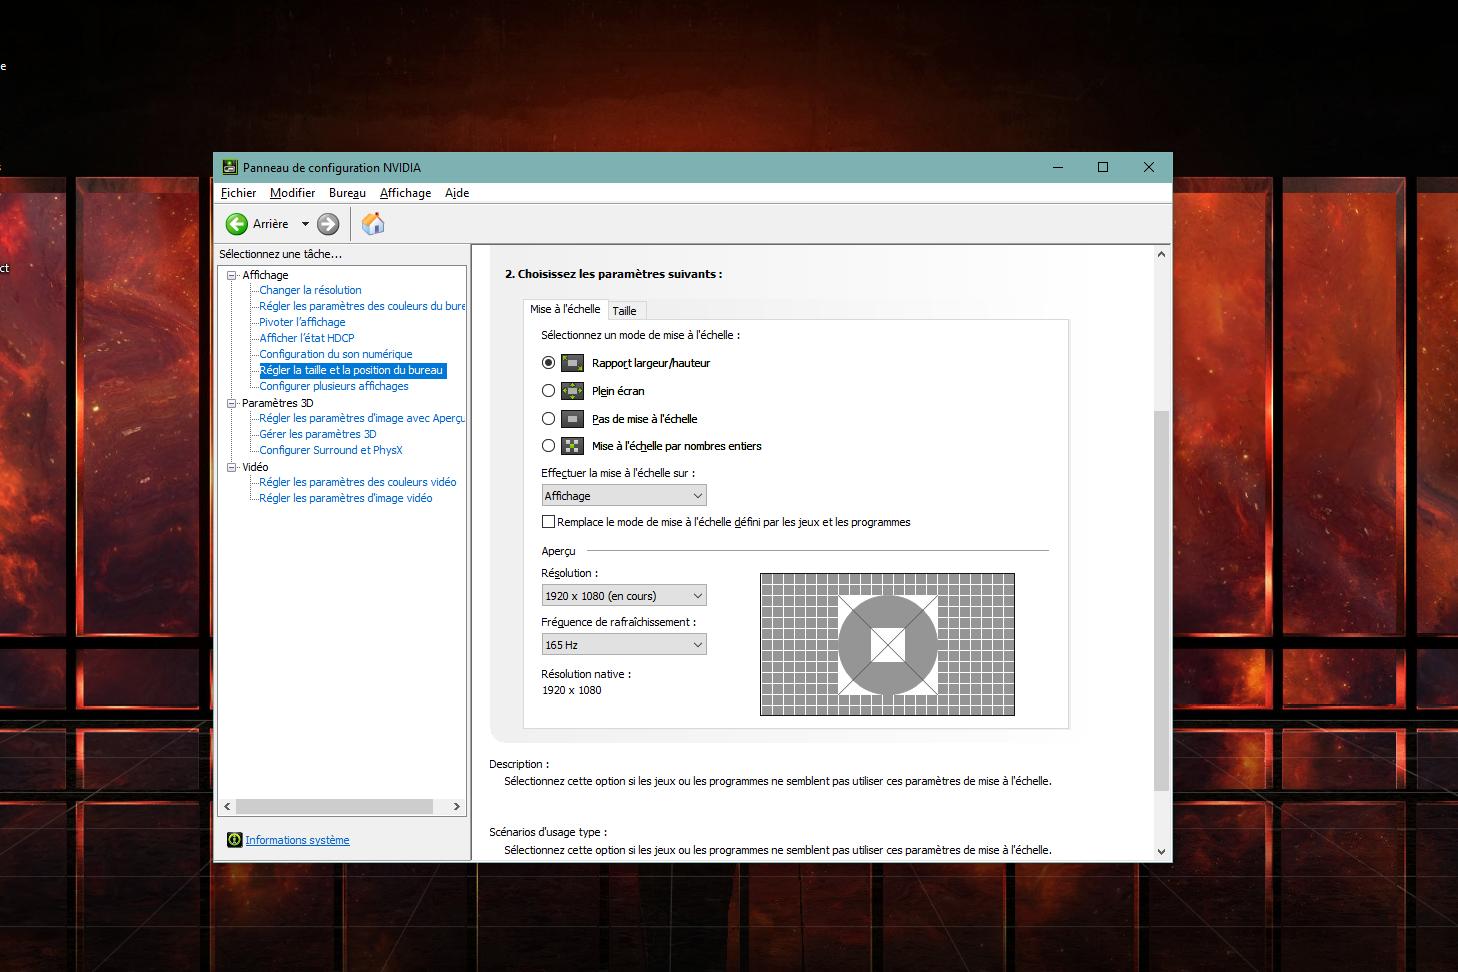 DesktopScreenshot2021.02.19-00.37.07.292.png